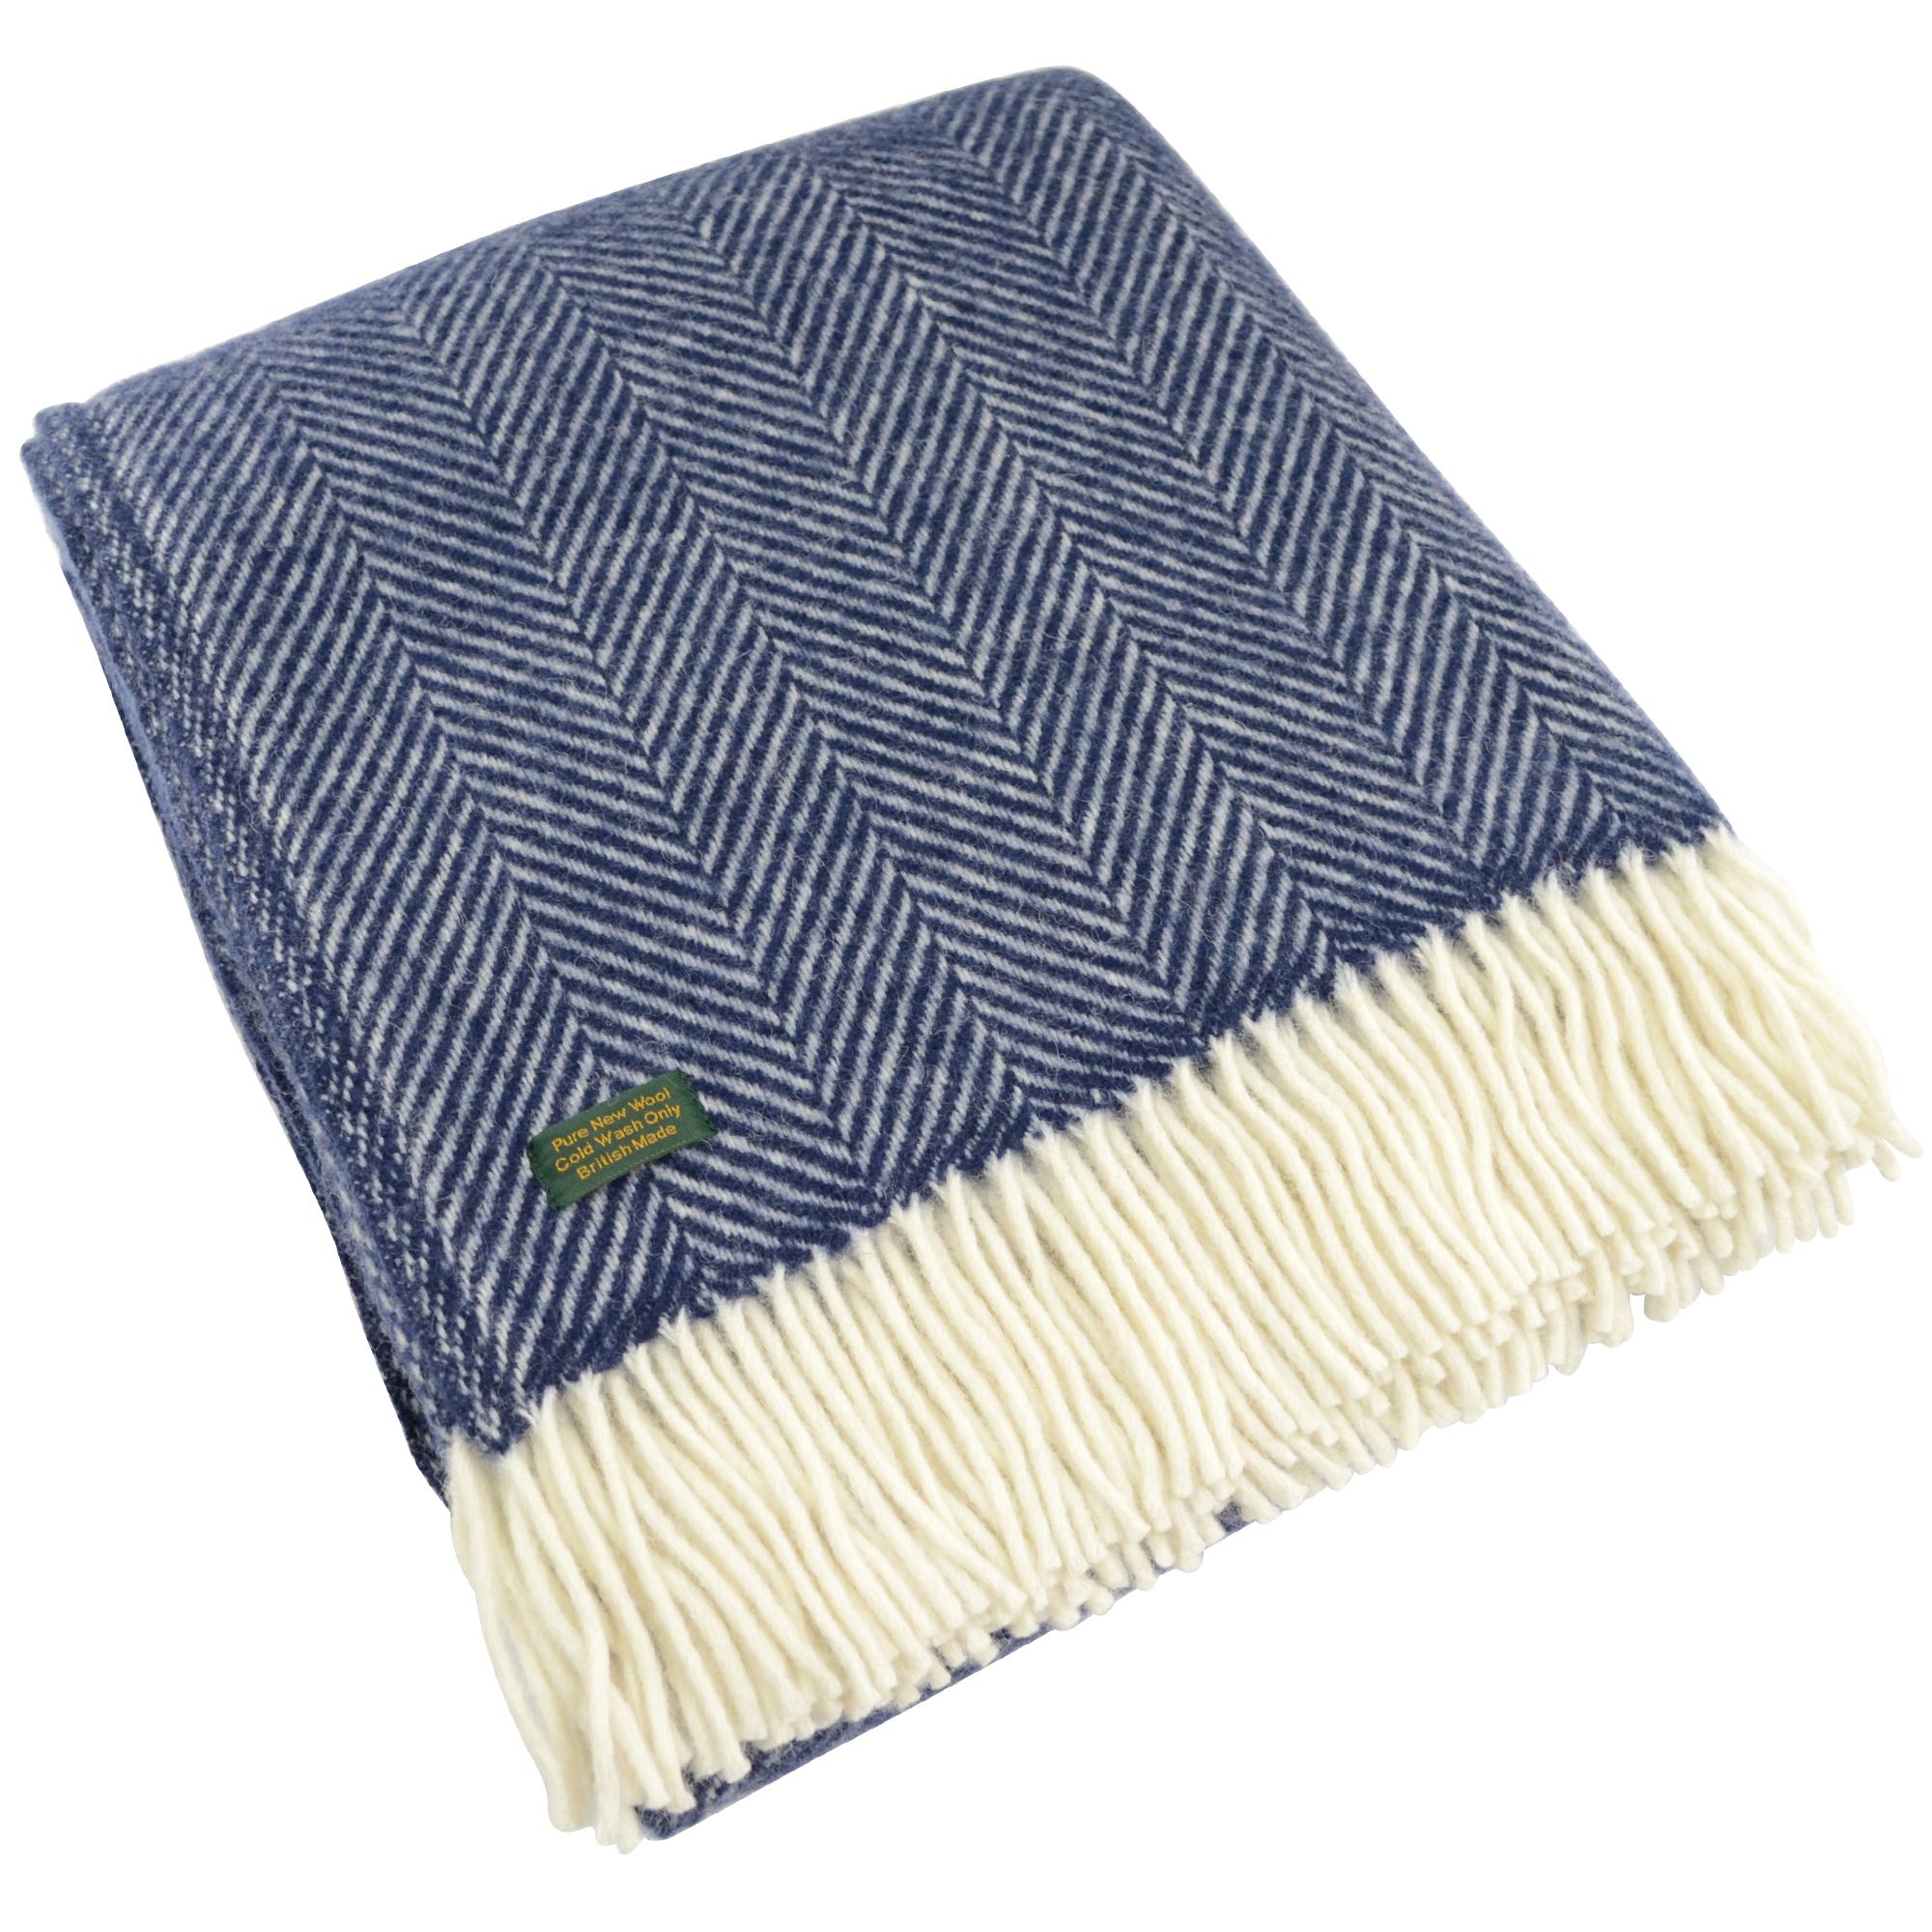 Pure New Wool Fishbone Blanket - Navy